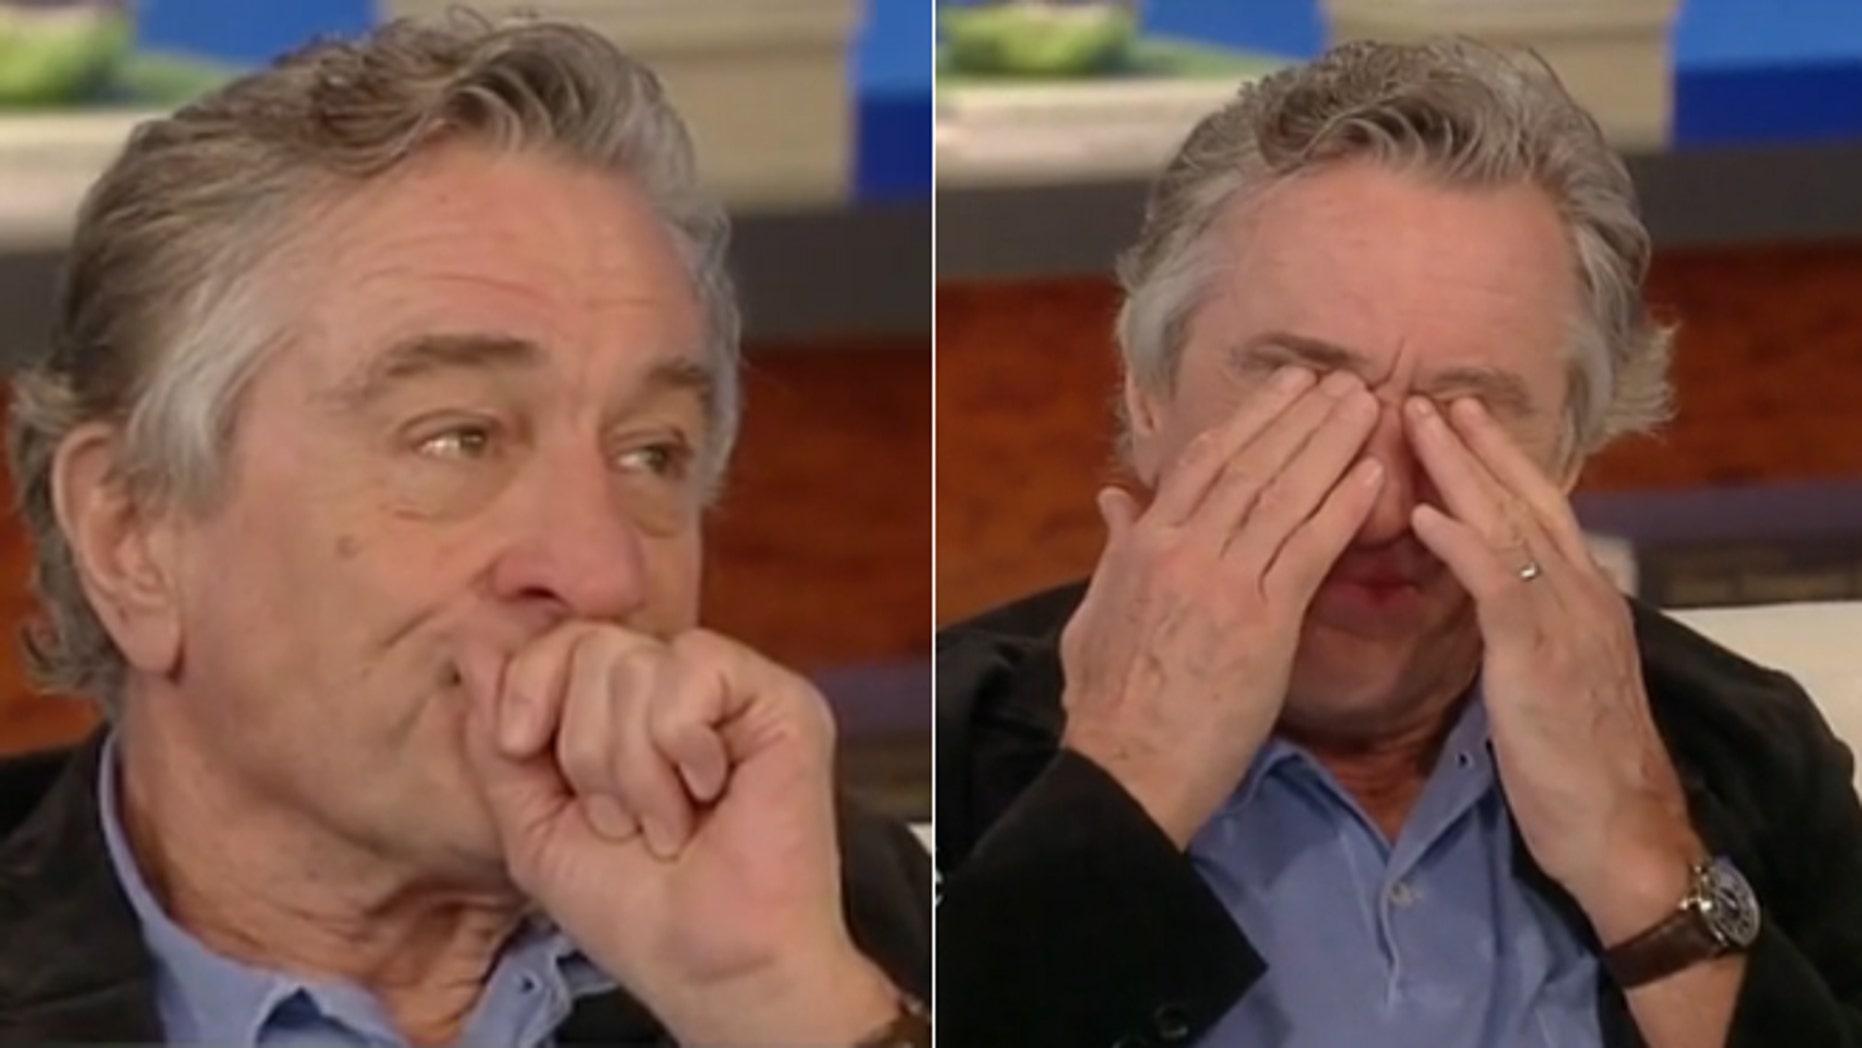 Robert De Niro tears up during an interview with Katie Couric.